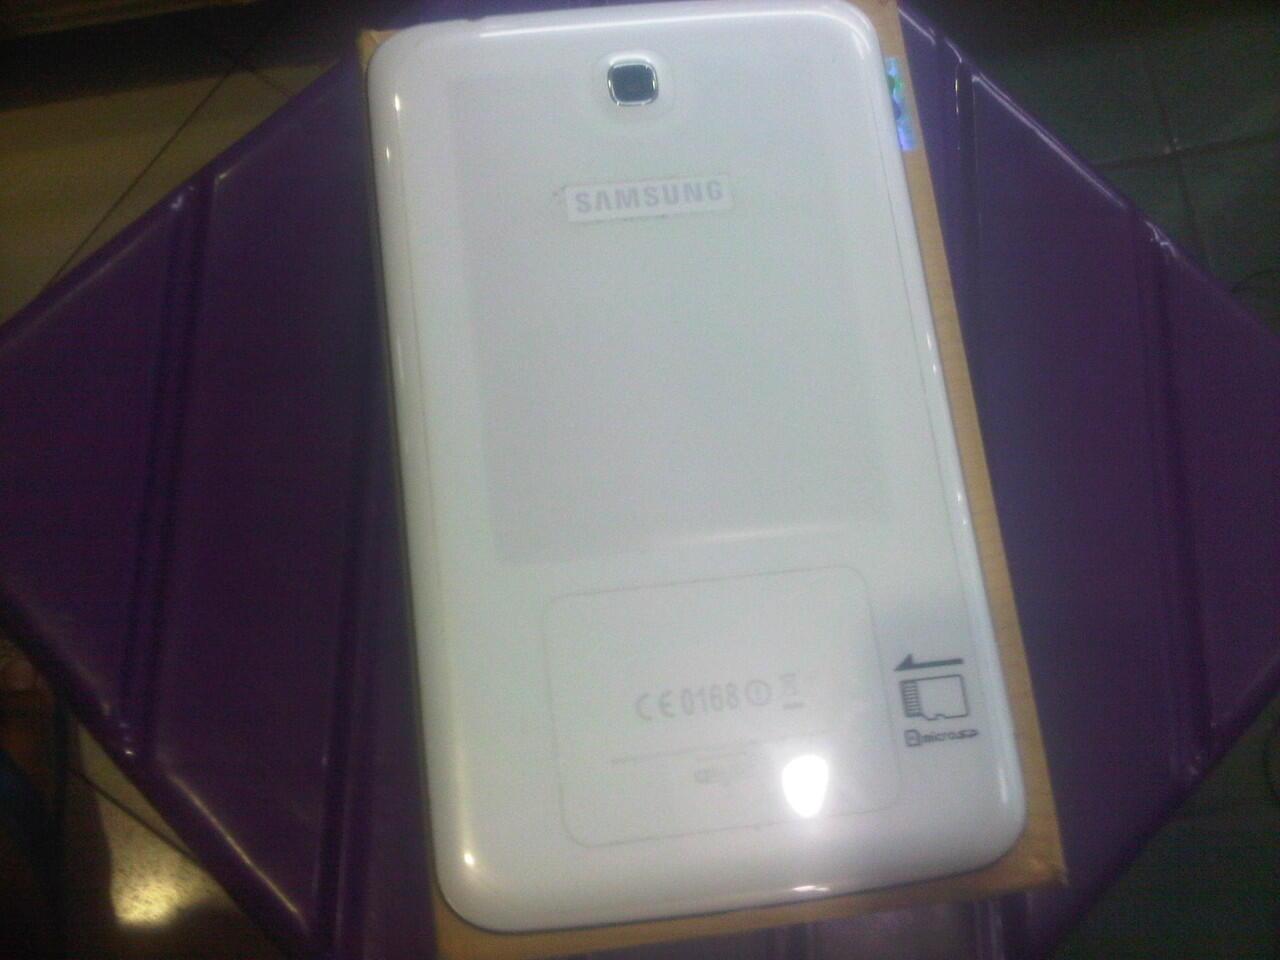 Galaxy Tab 3 7.0 (SM-T210) white wifi only mulussss (arab)